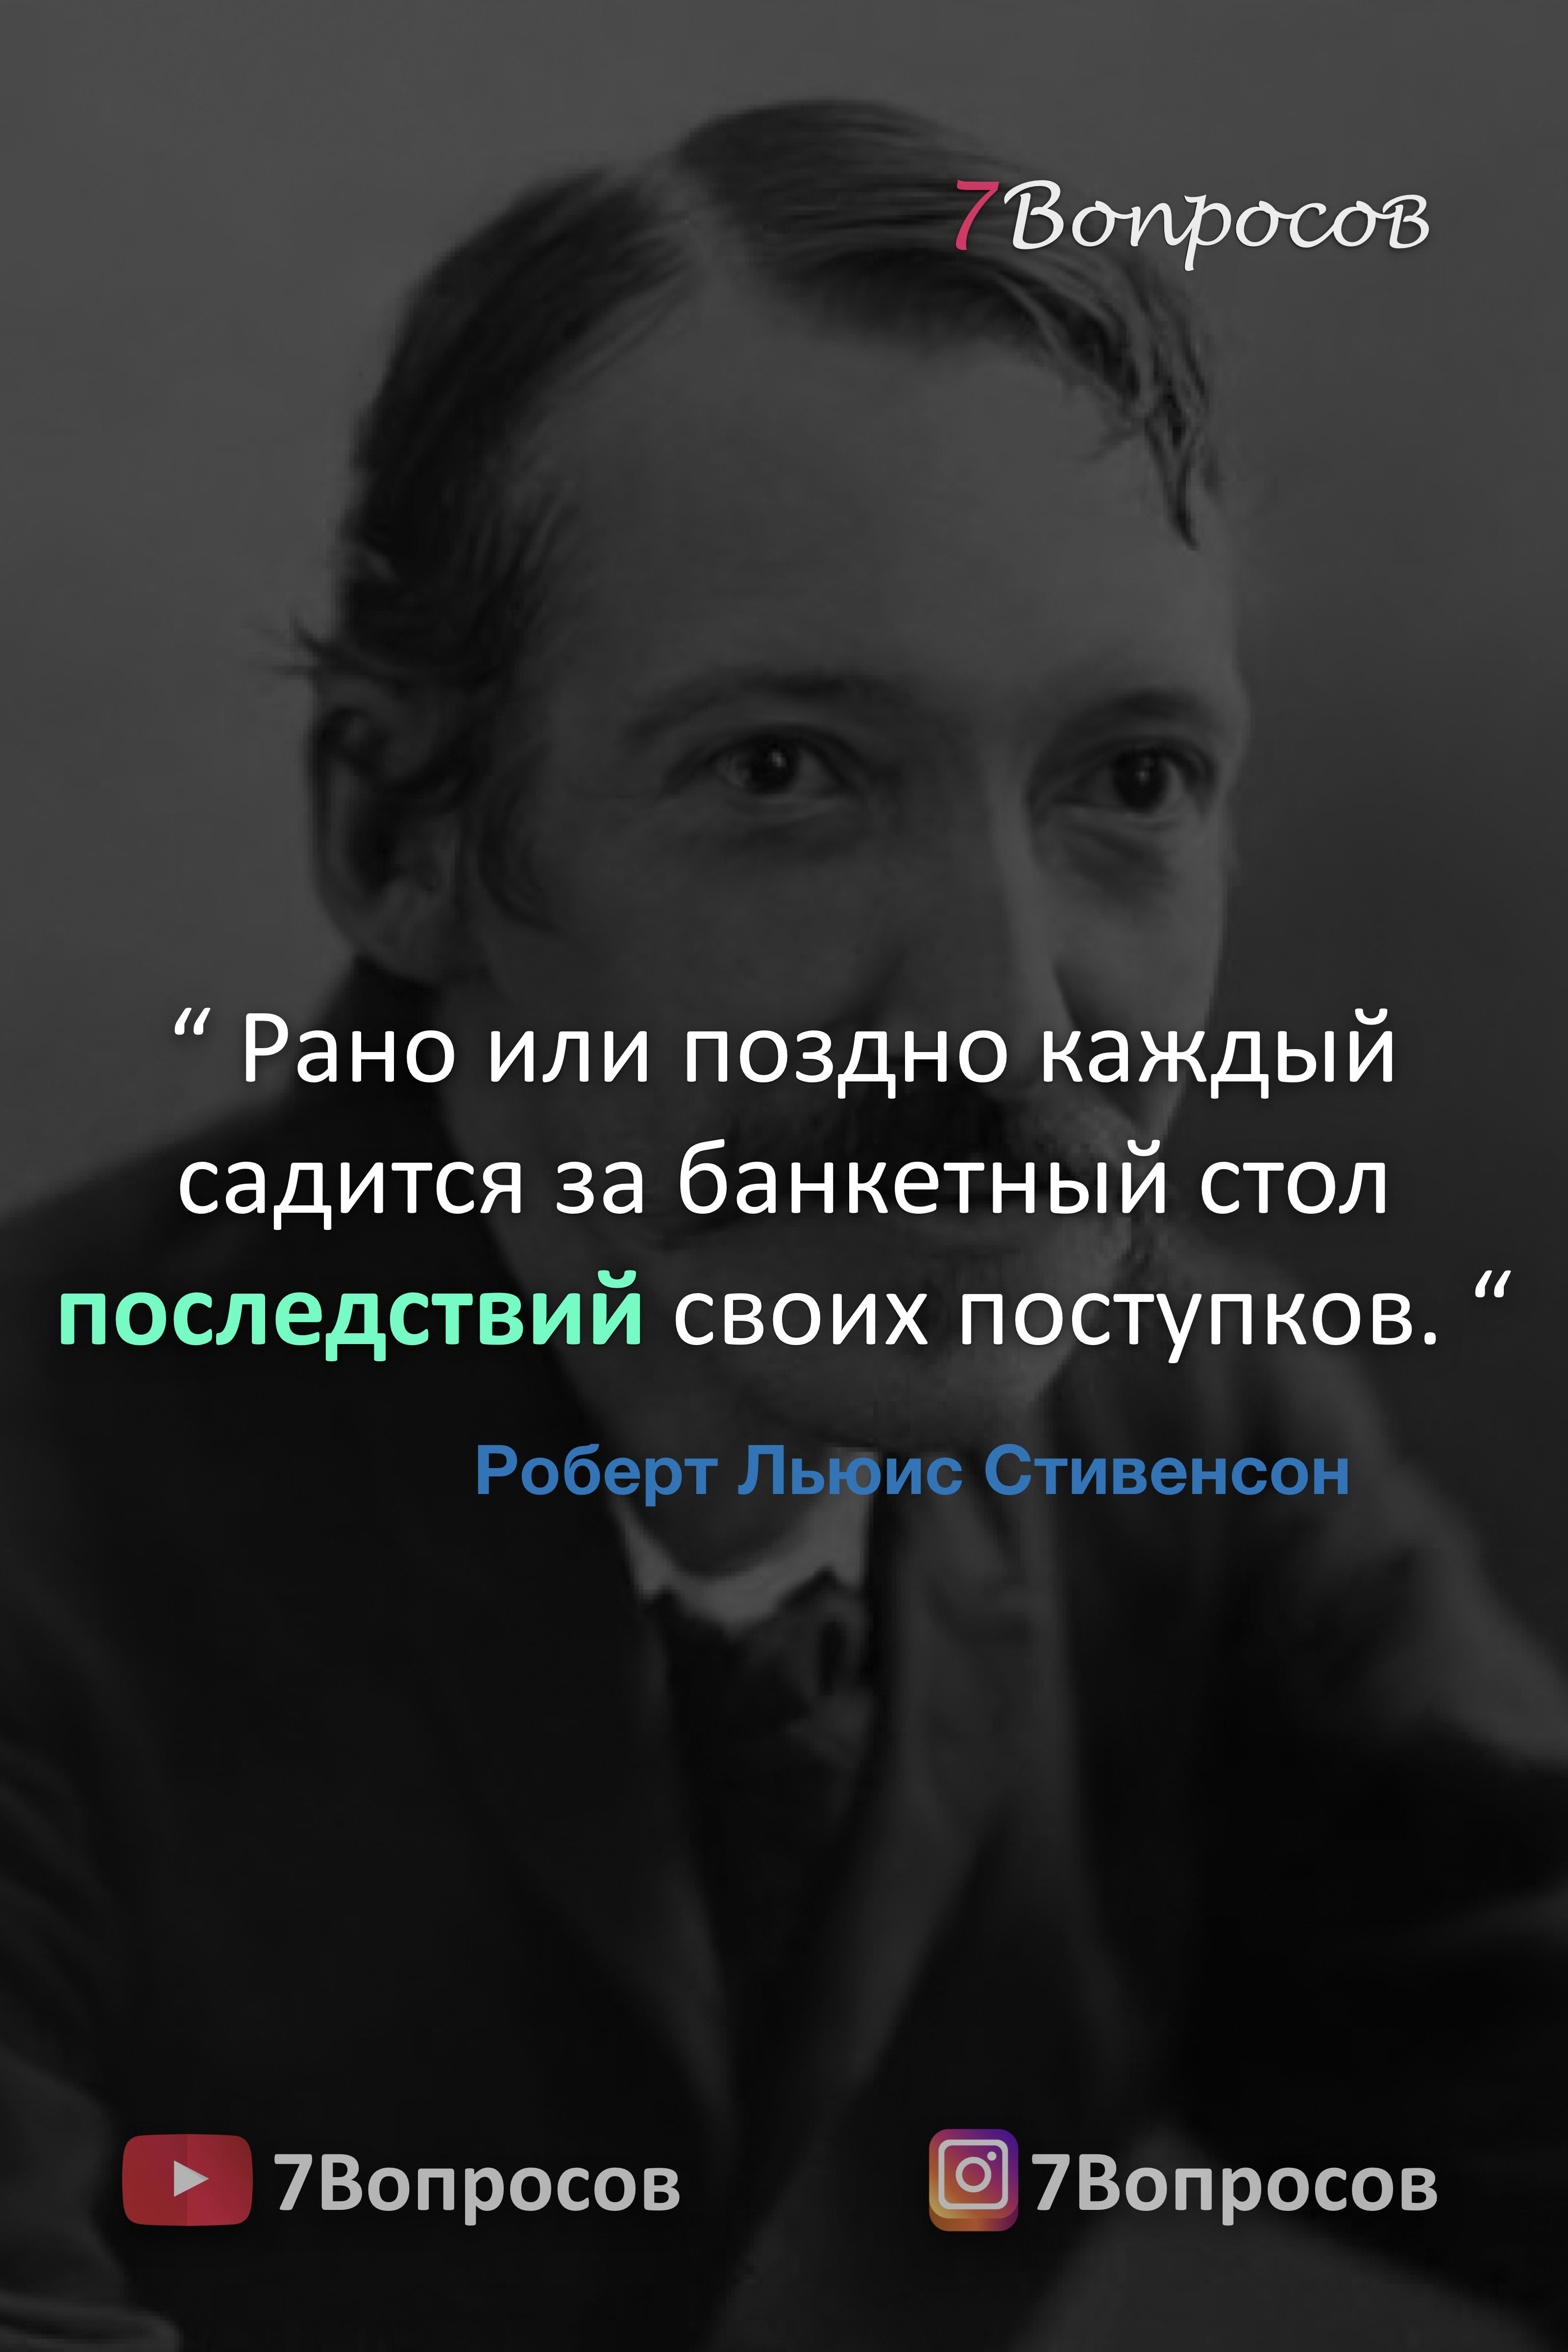 Photo of Цитаты писателей. Роберт Льюис Стивенсон.